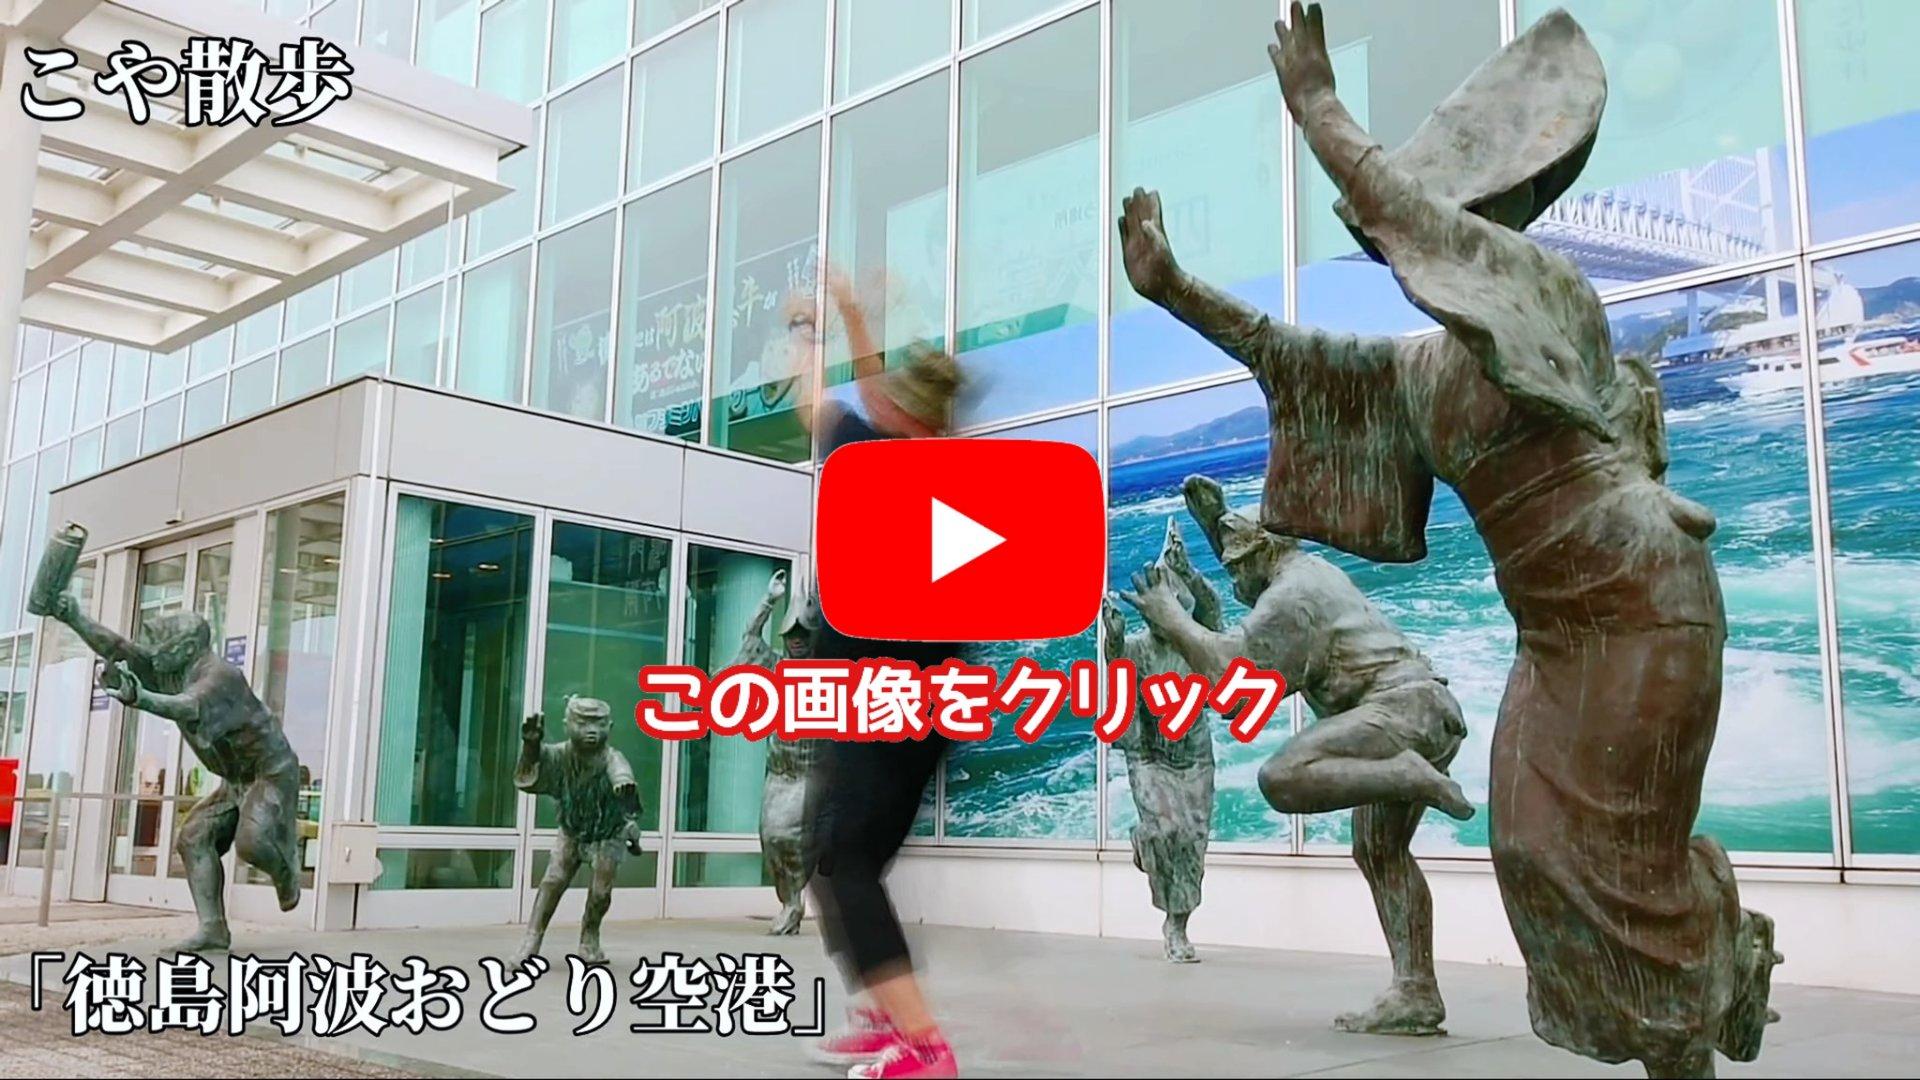 【阿波踊り空港】徳島県唯一の空港